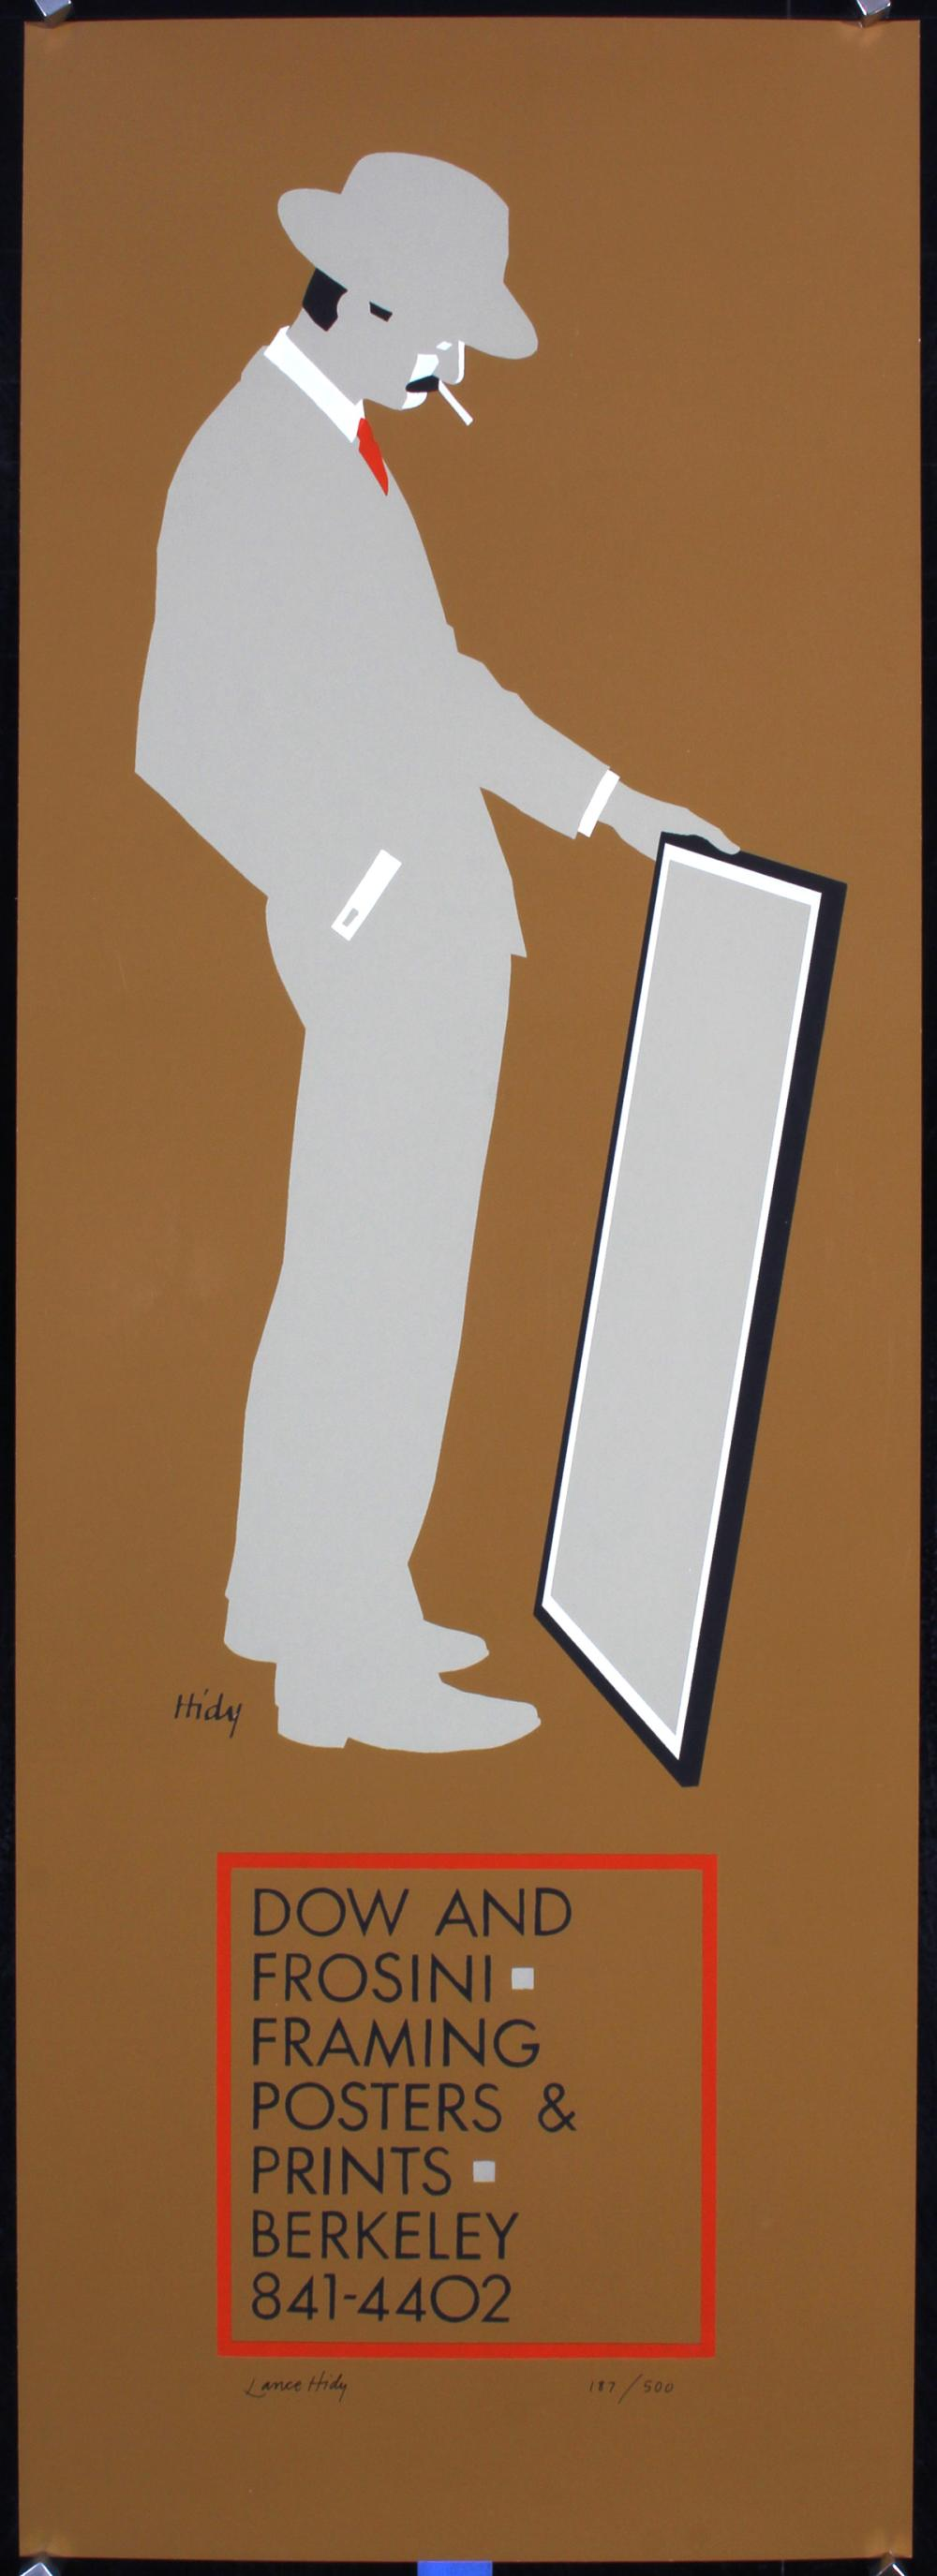 Lance Hidy original Poster